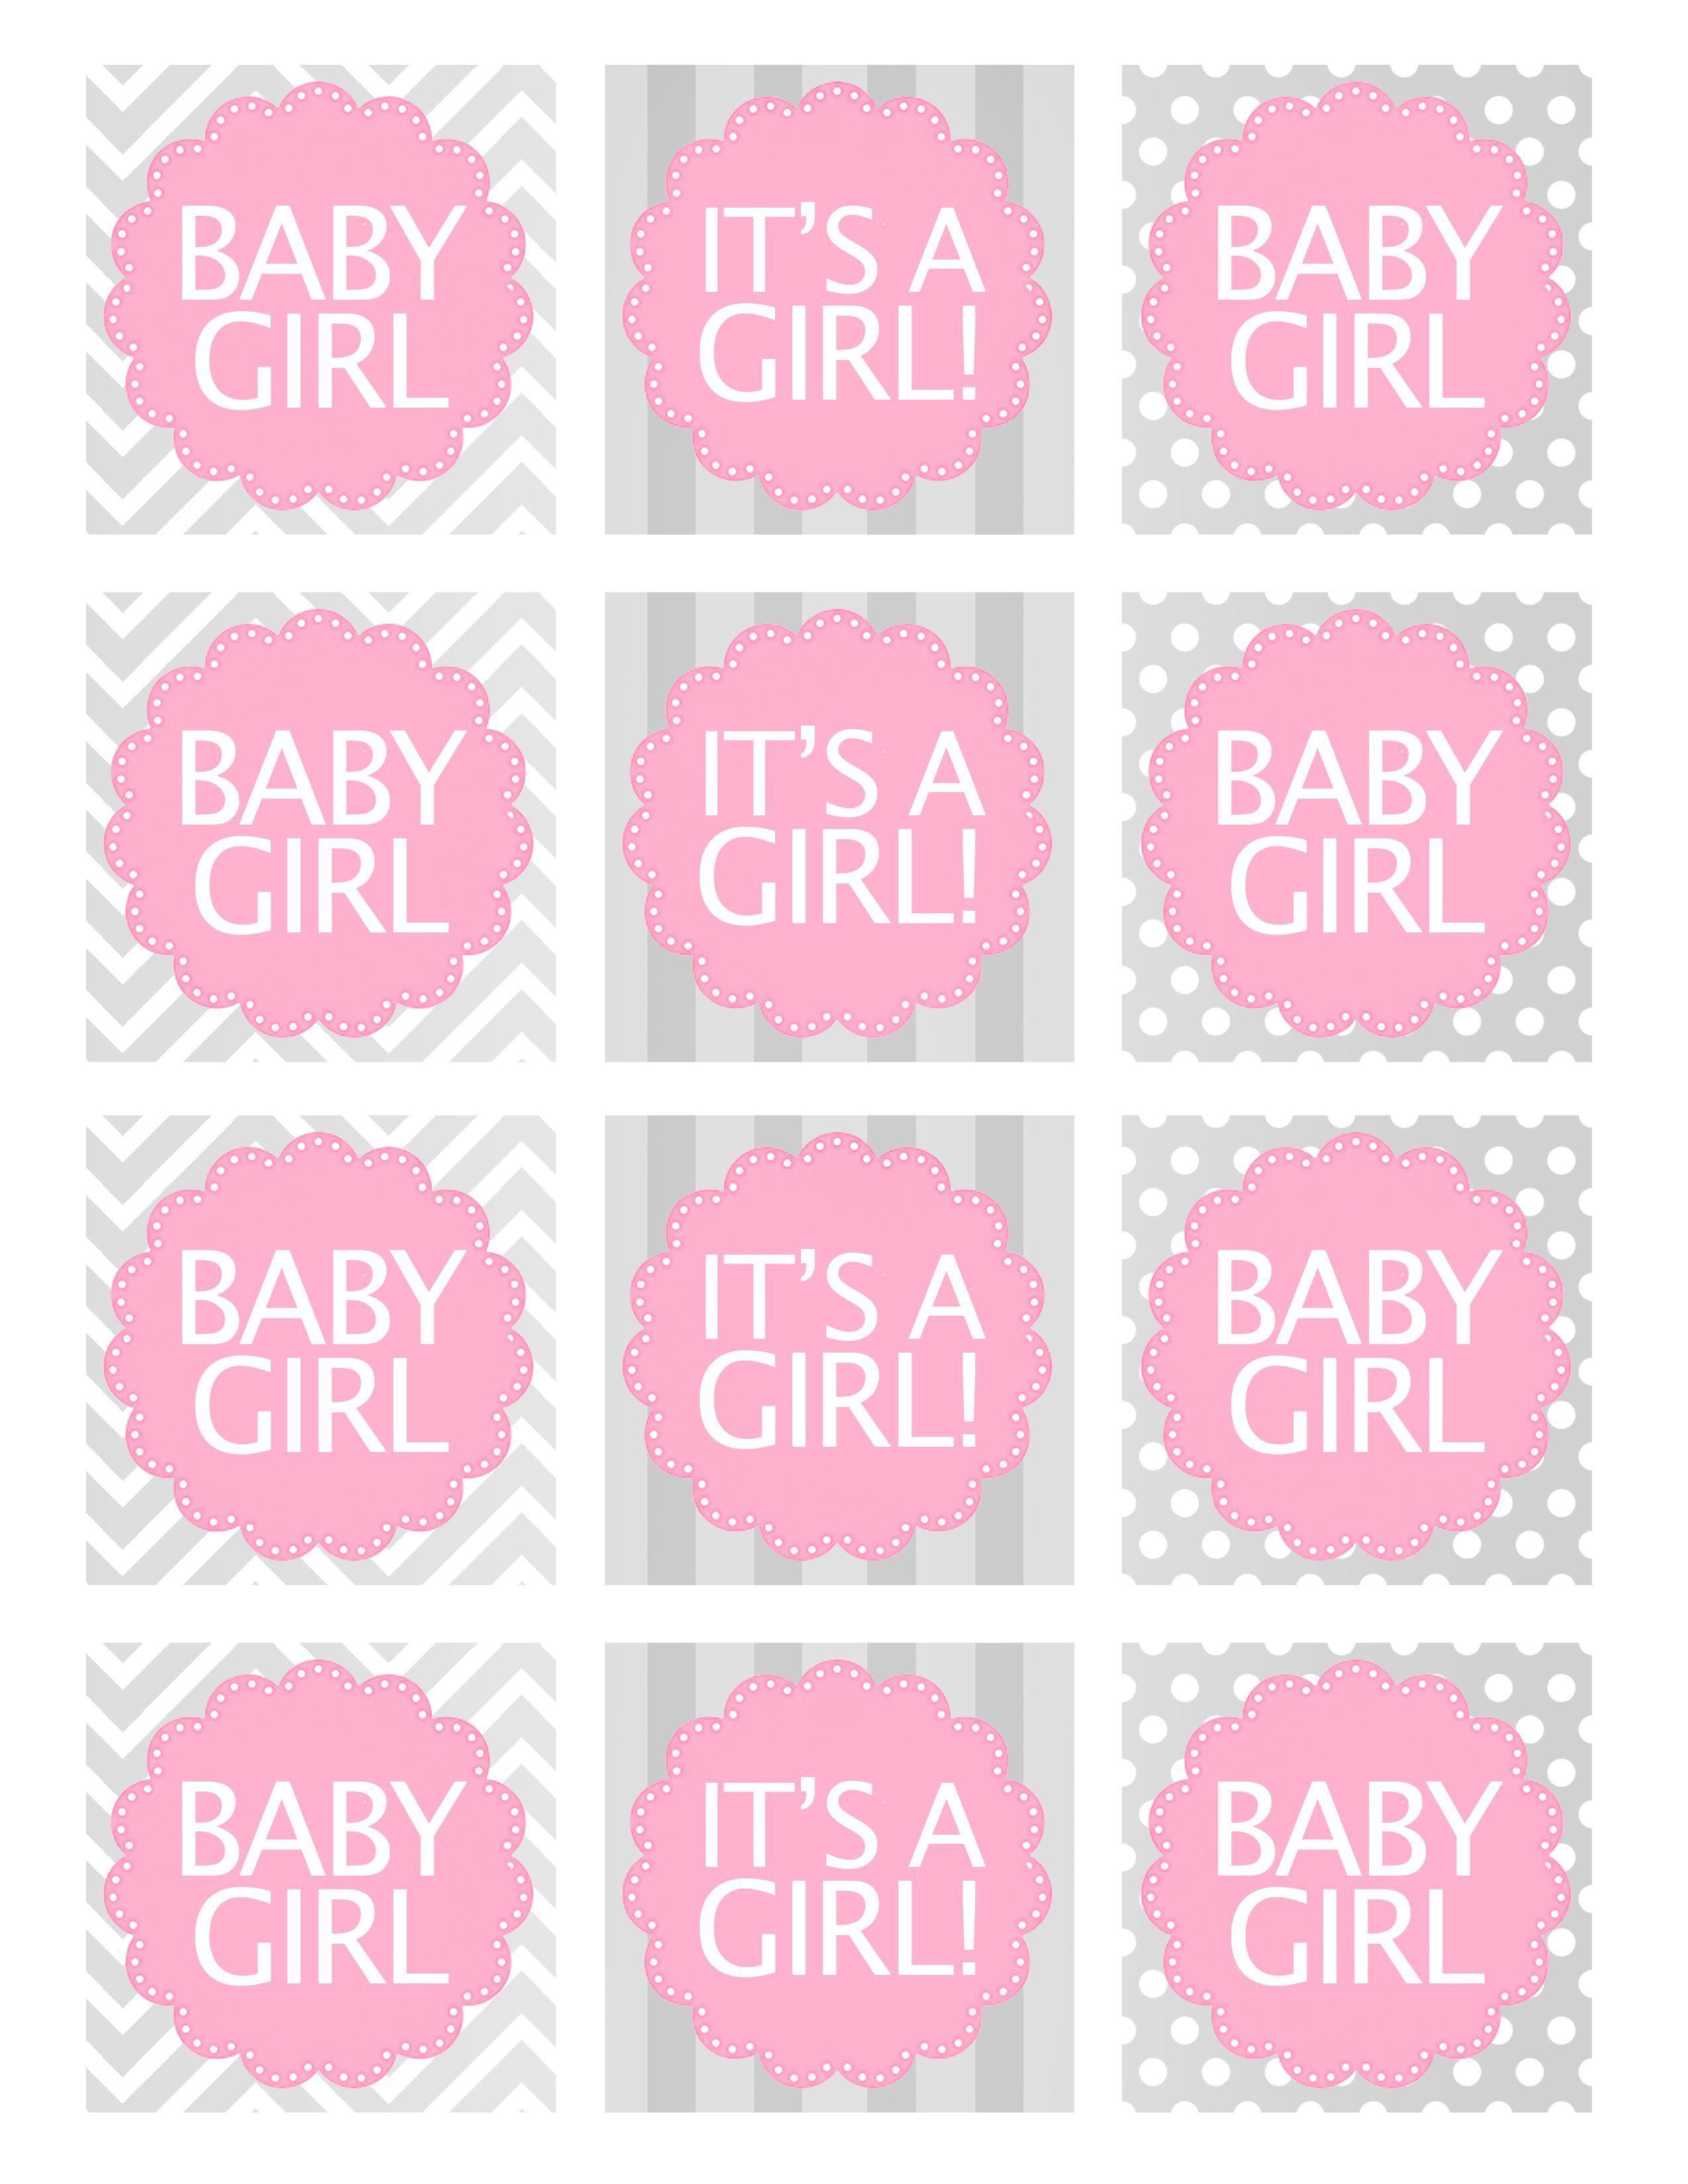 000 Remarkable Baby Shower Printable Girl High Def  Sheet Cake Cute For AFull